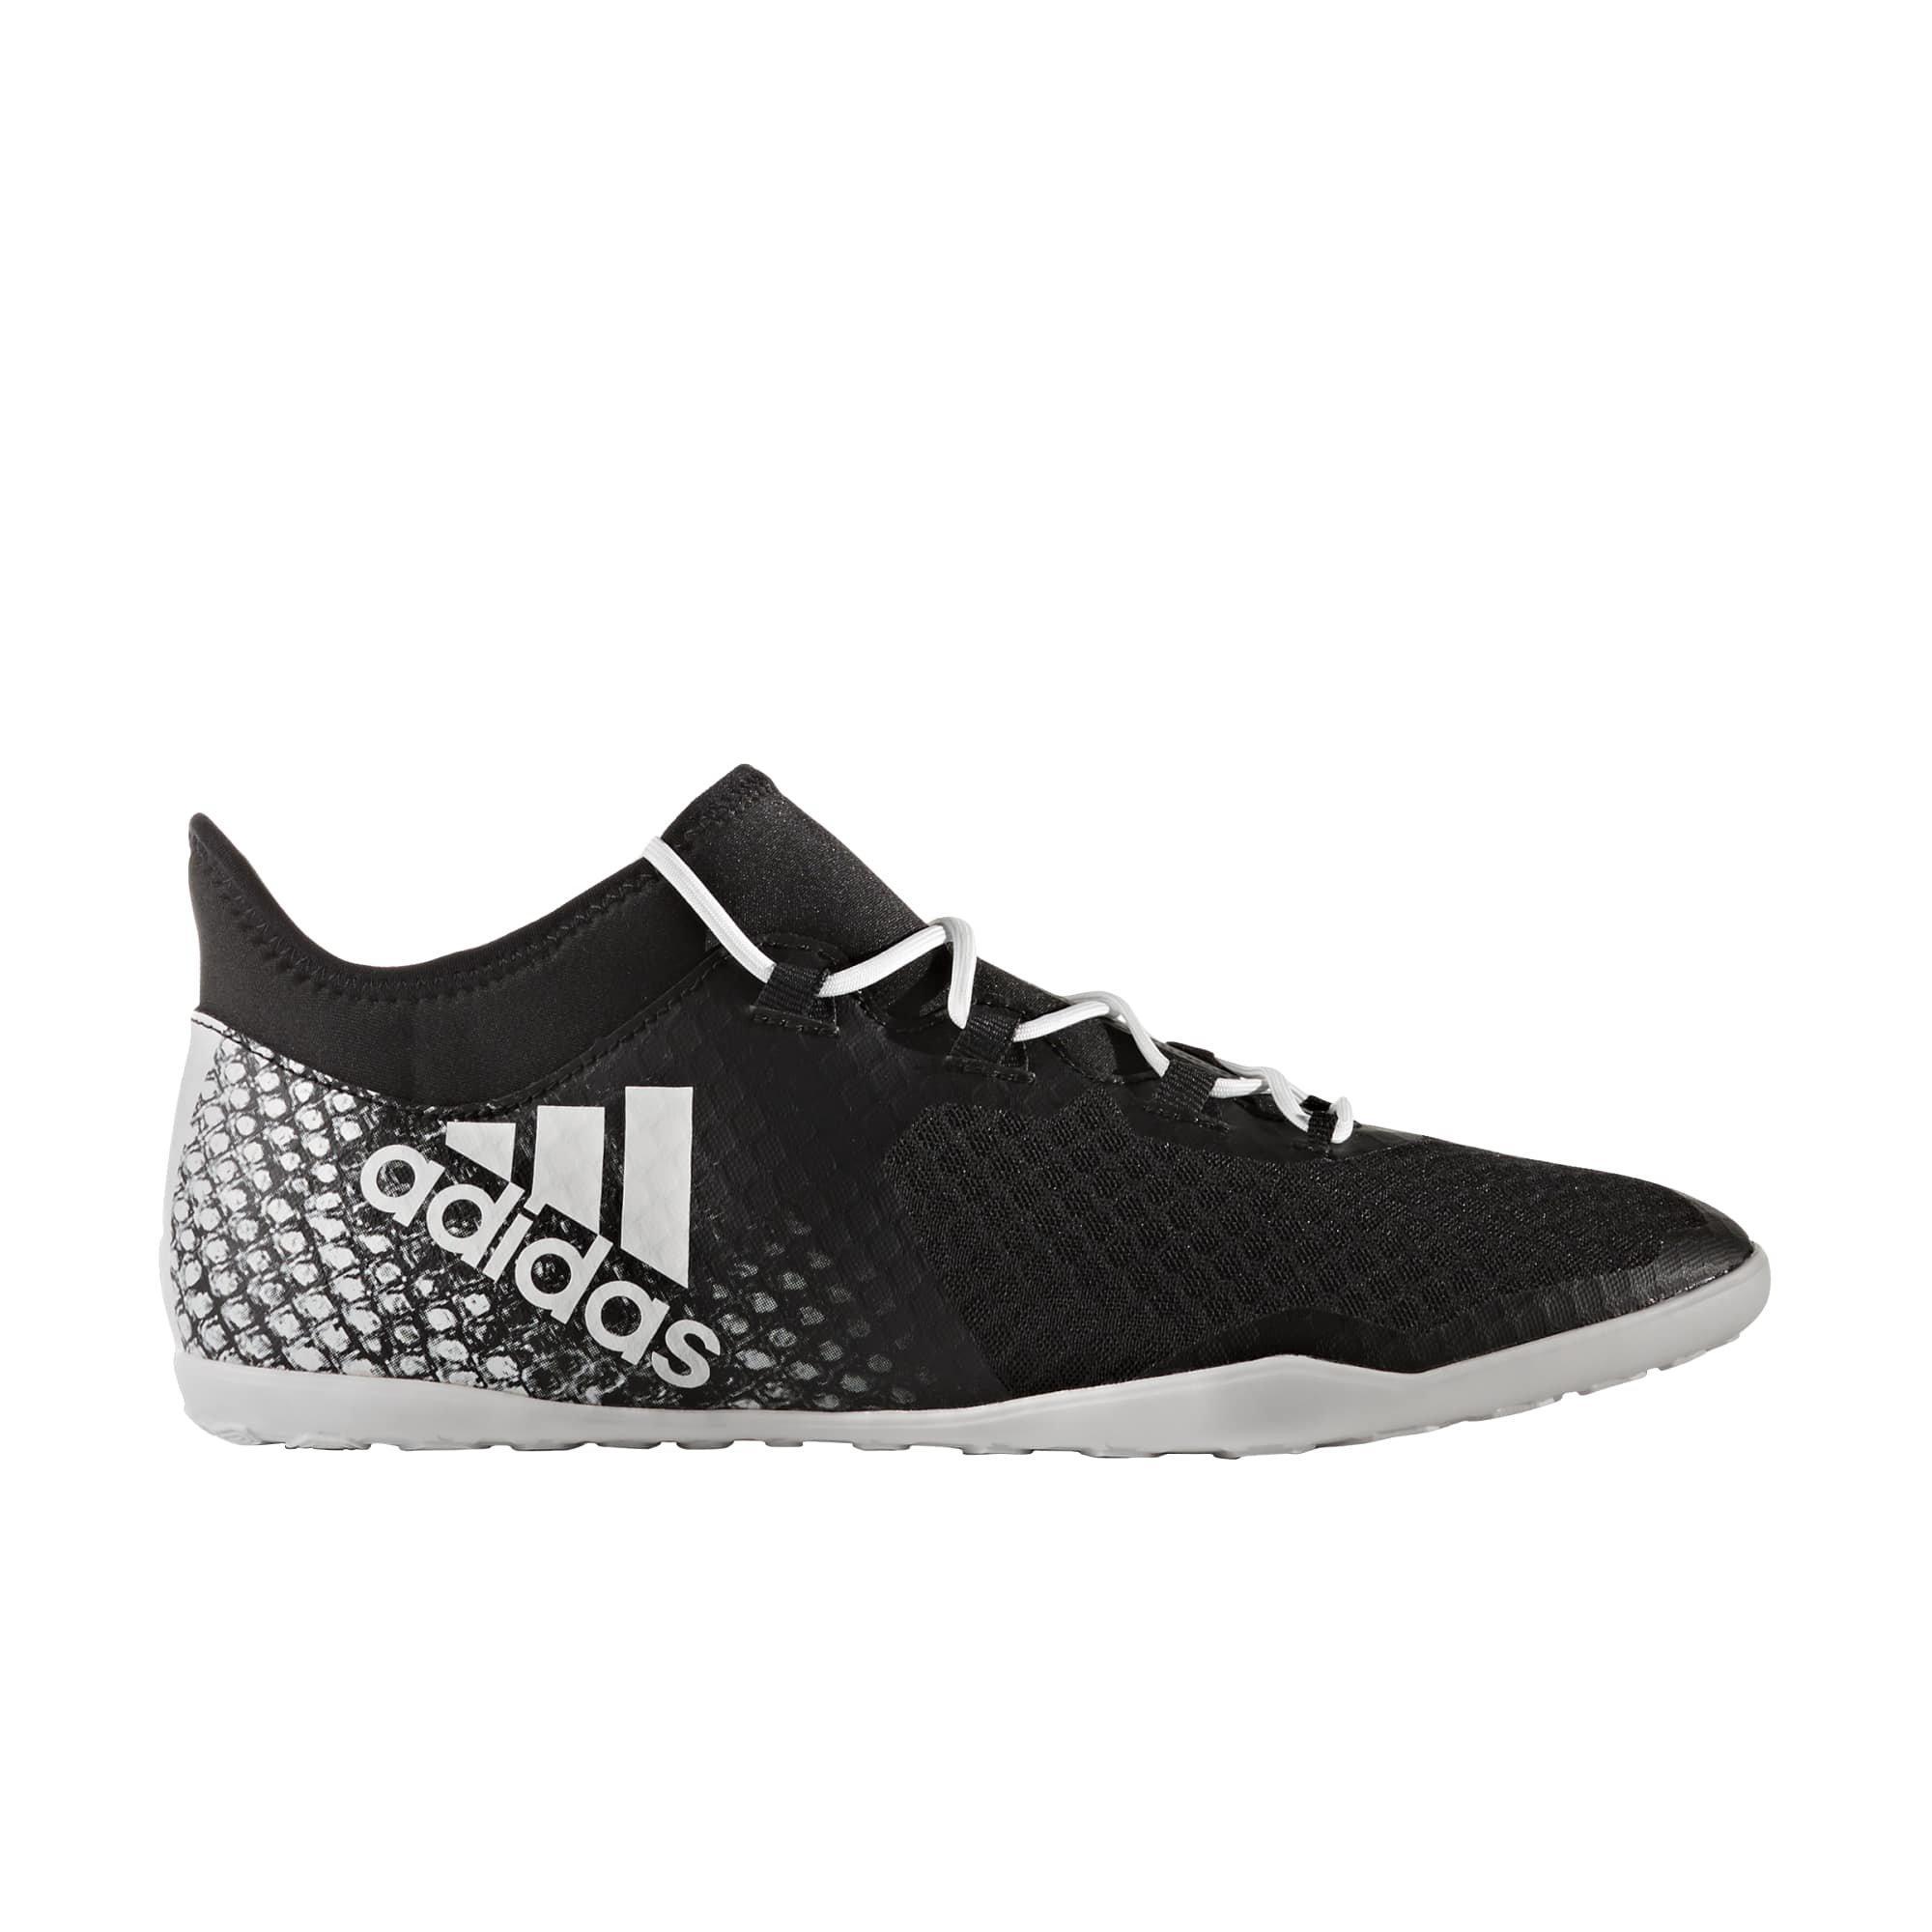 adidas X 16.2 Court Men\u0027s Indoor Soccer Shoe - Main Container Image 1